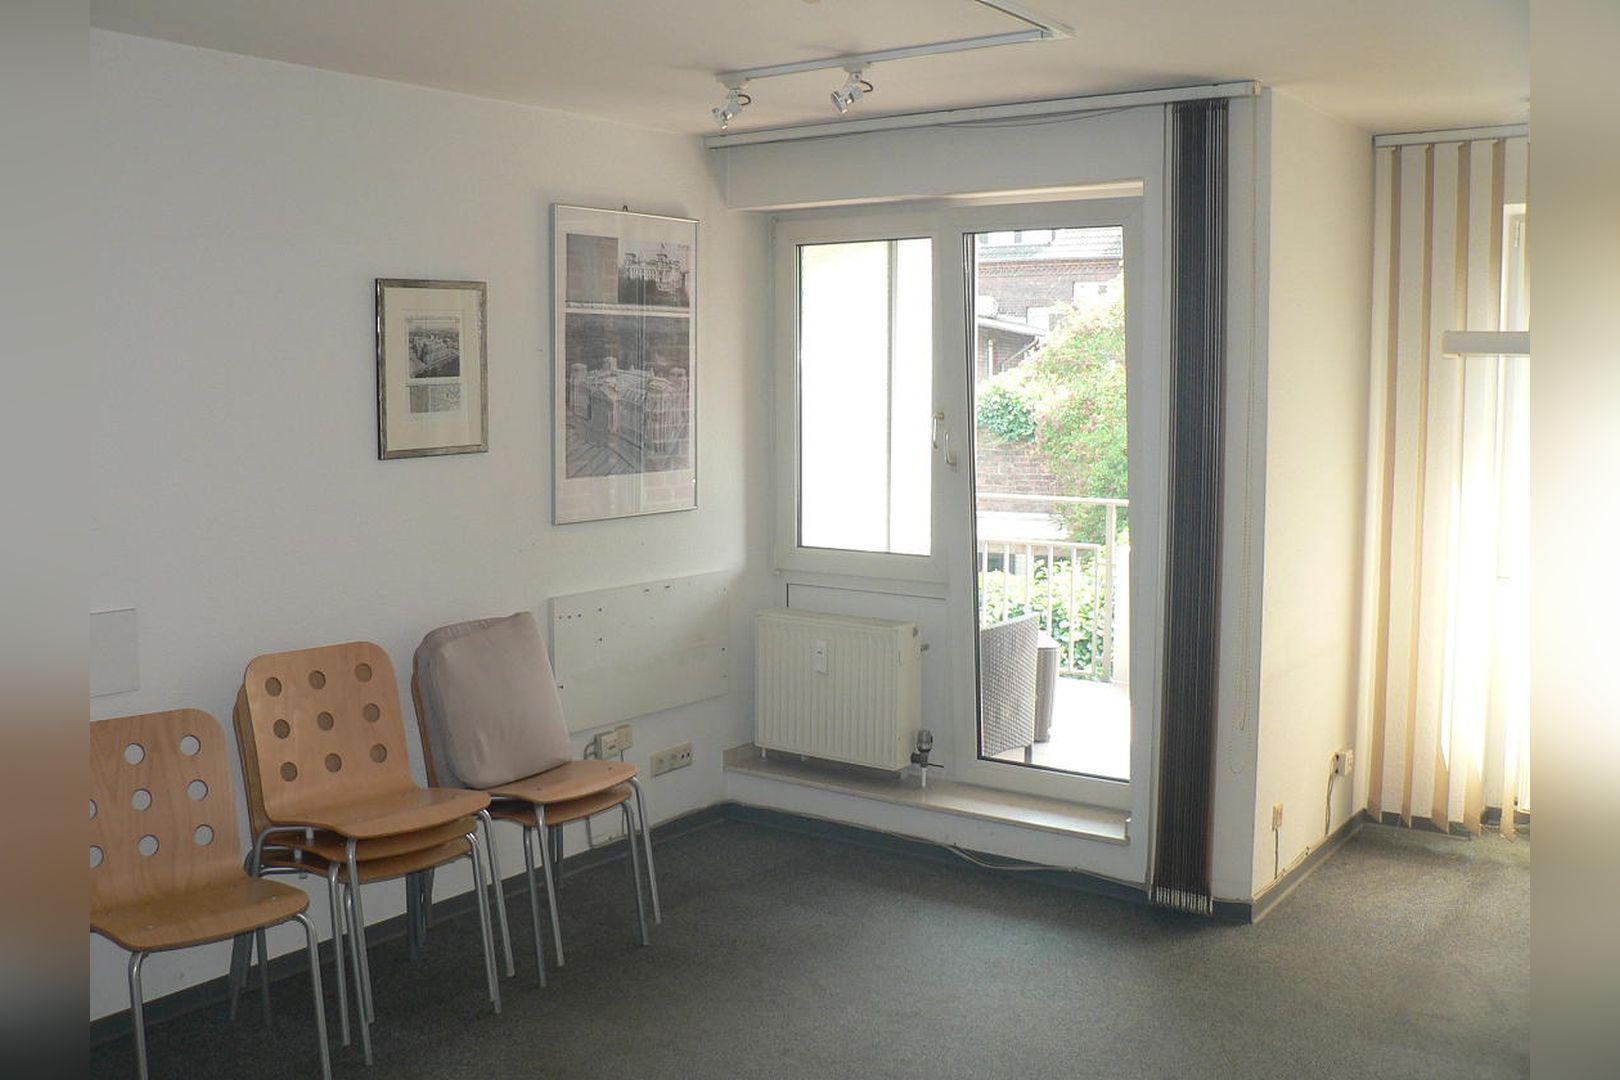 Immobilie Nr.0234 | Hauptstraße 44, 40668 Meerbusch Lank